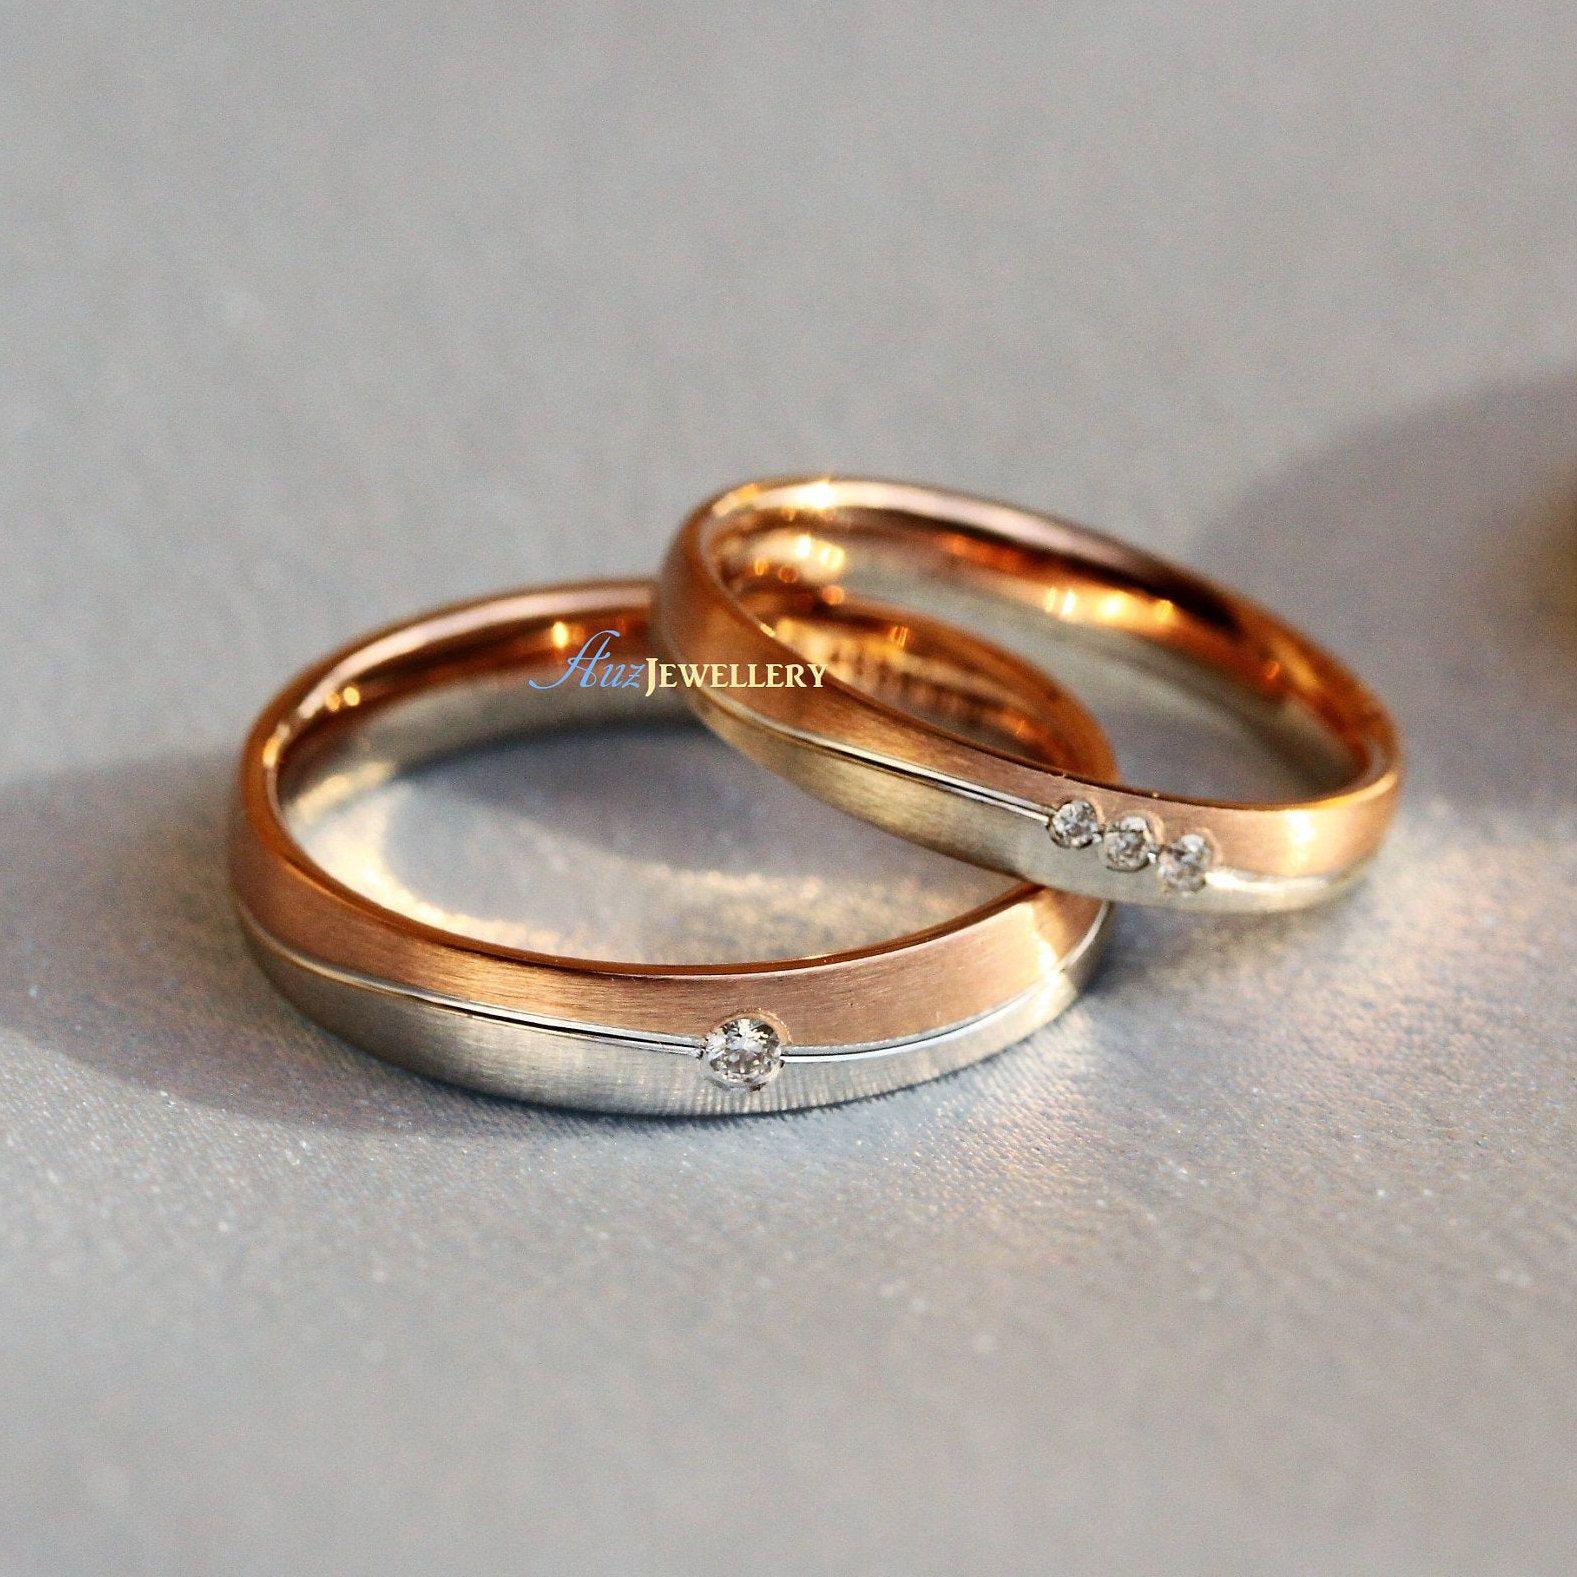 Wedding Couple Rings Gold Designs With Price Addicfashion